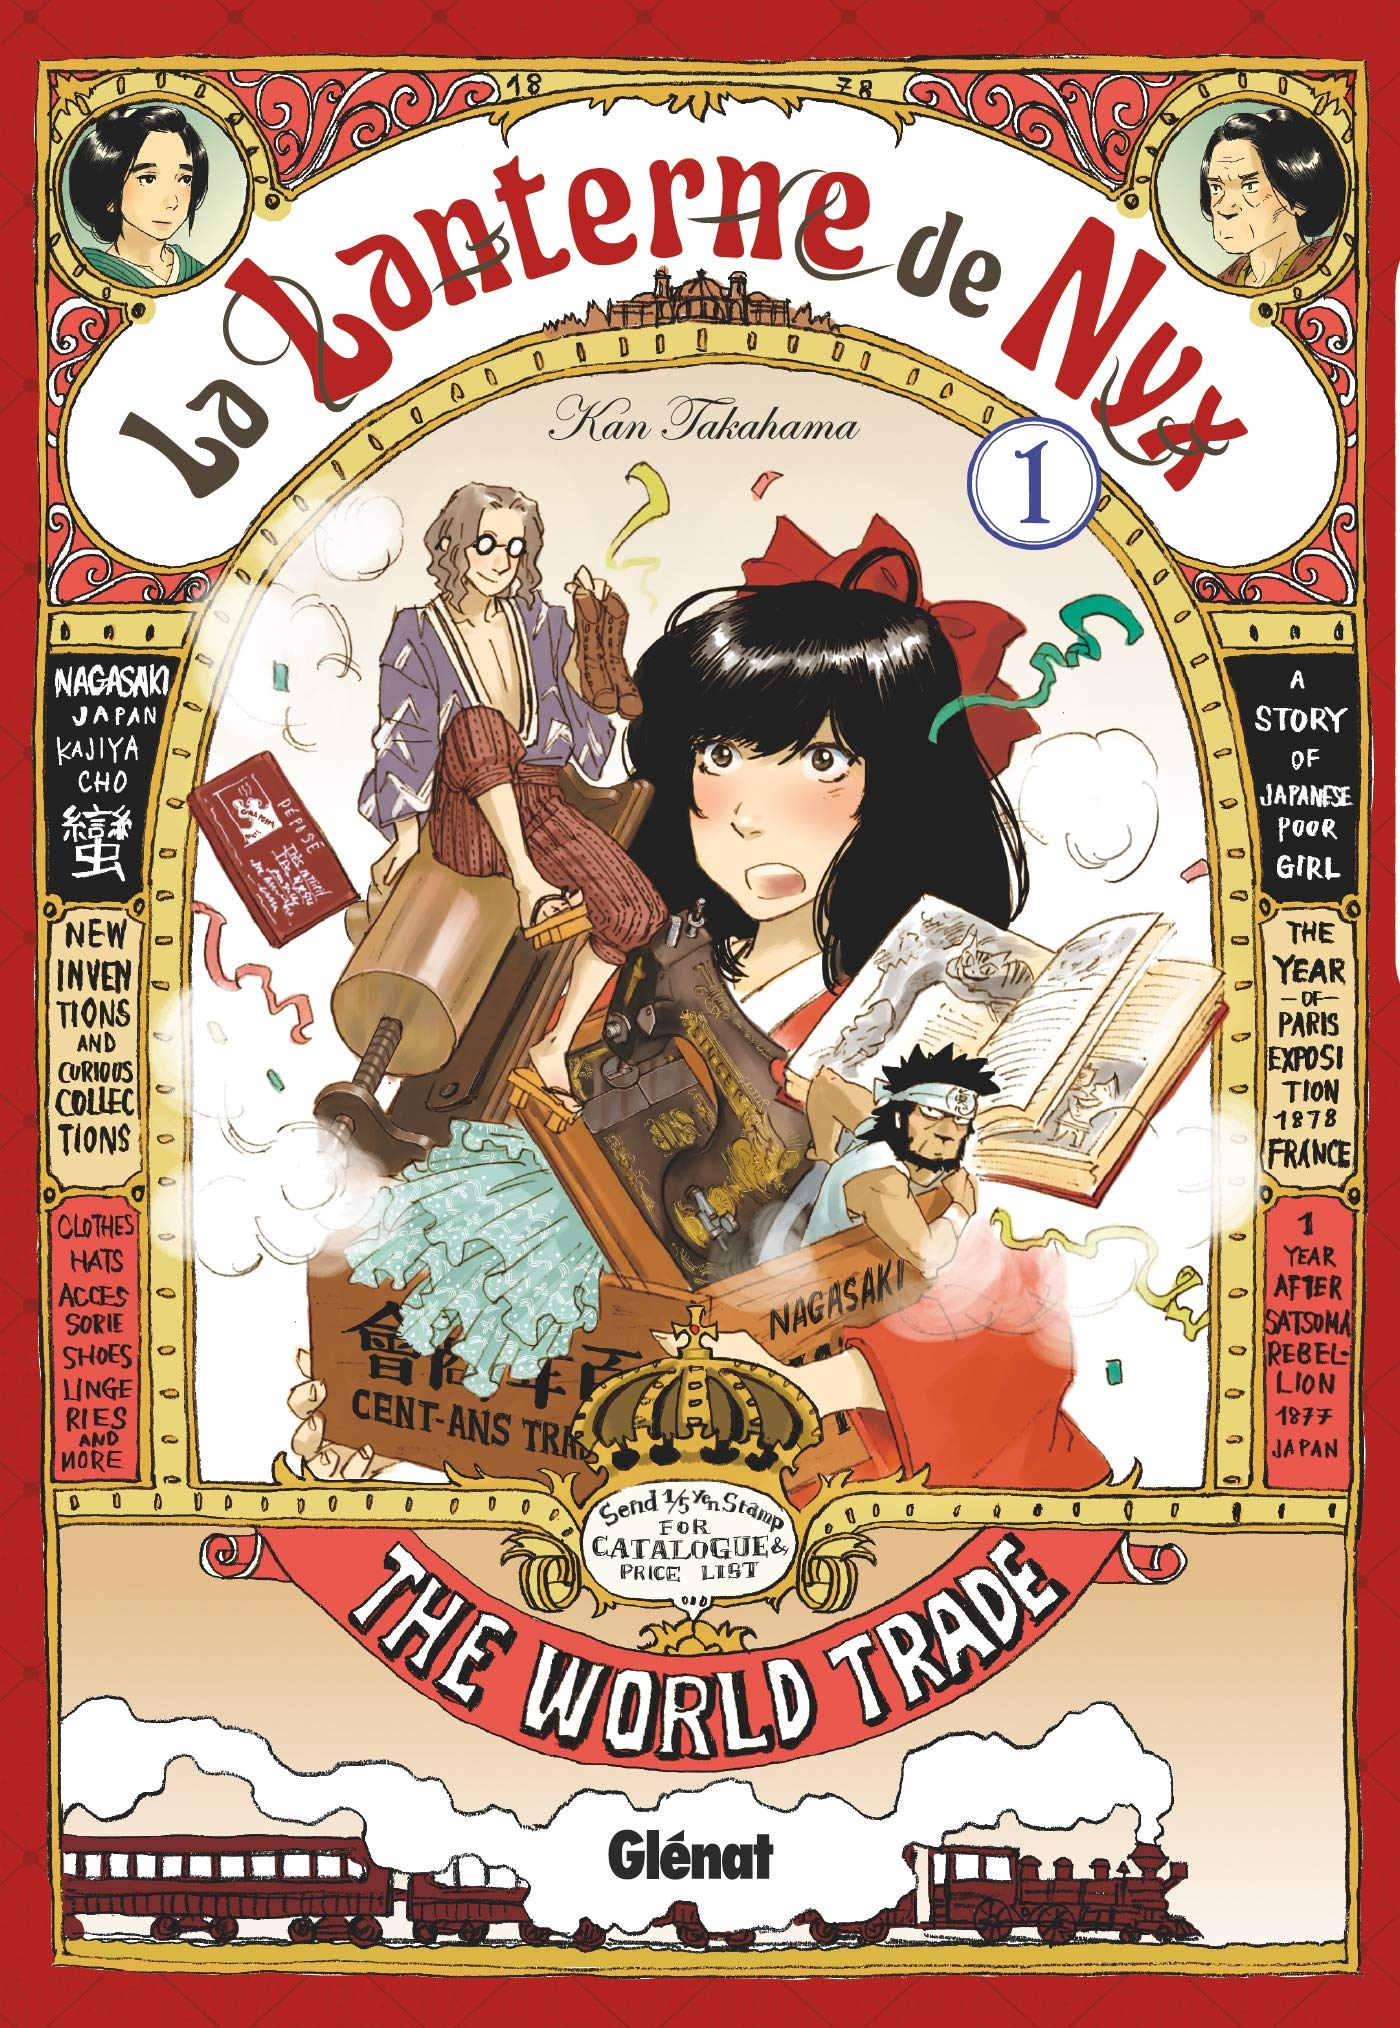 La Lanterne De Nyx Tome 01 La Lanterne De Nyx 1 French Edition Takahama Kan 9782344033708 Amazon Com Books